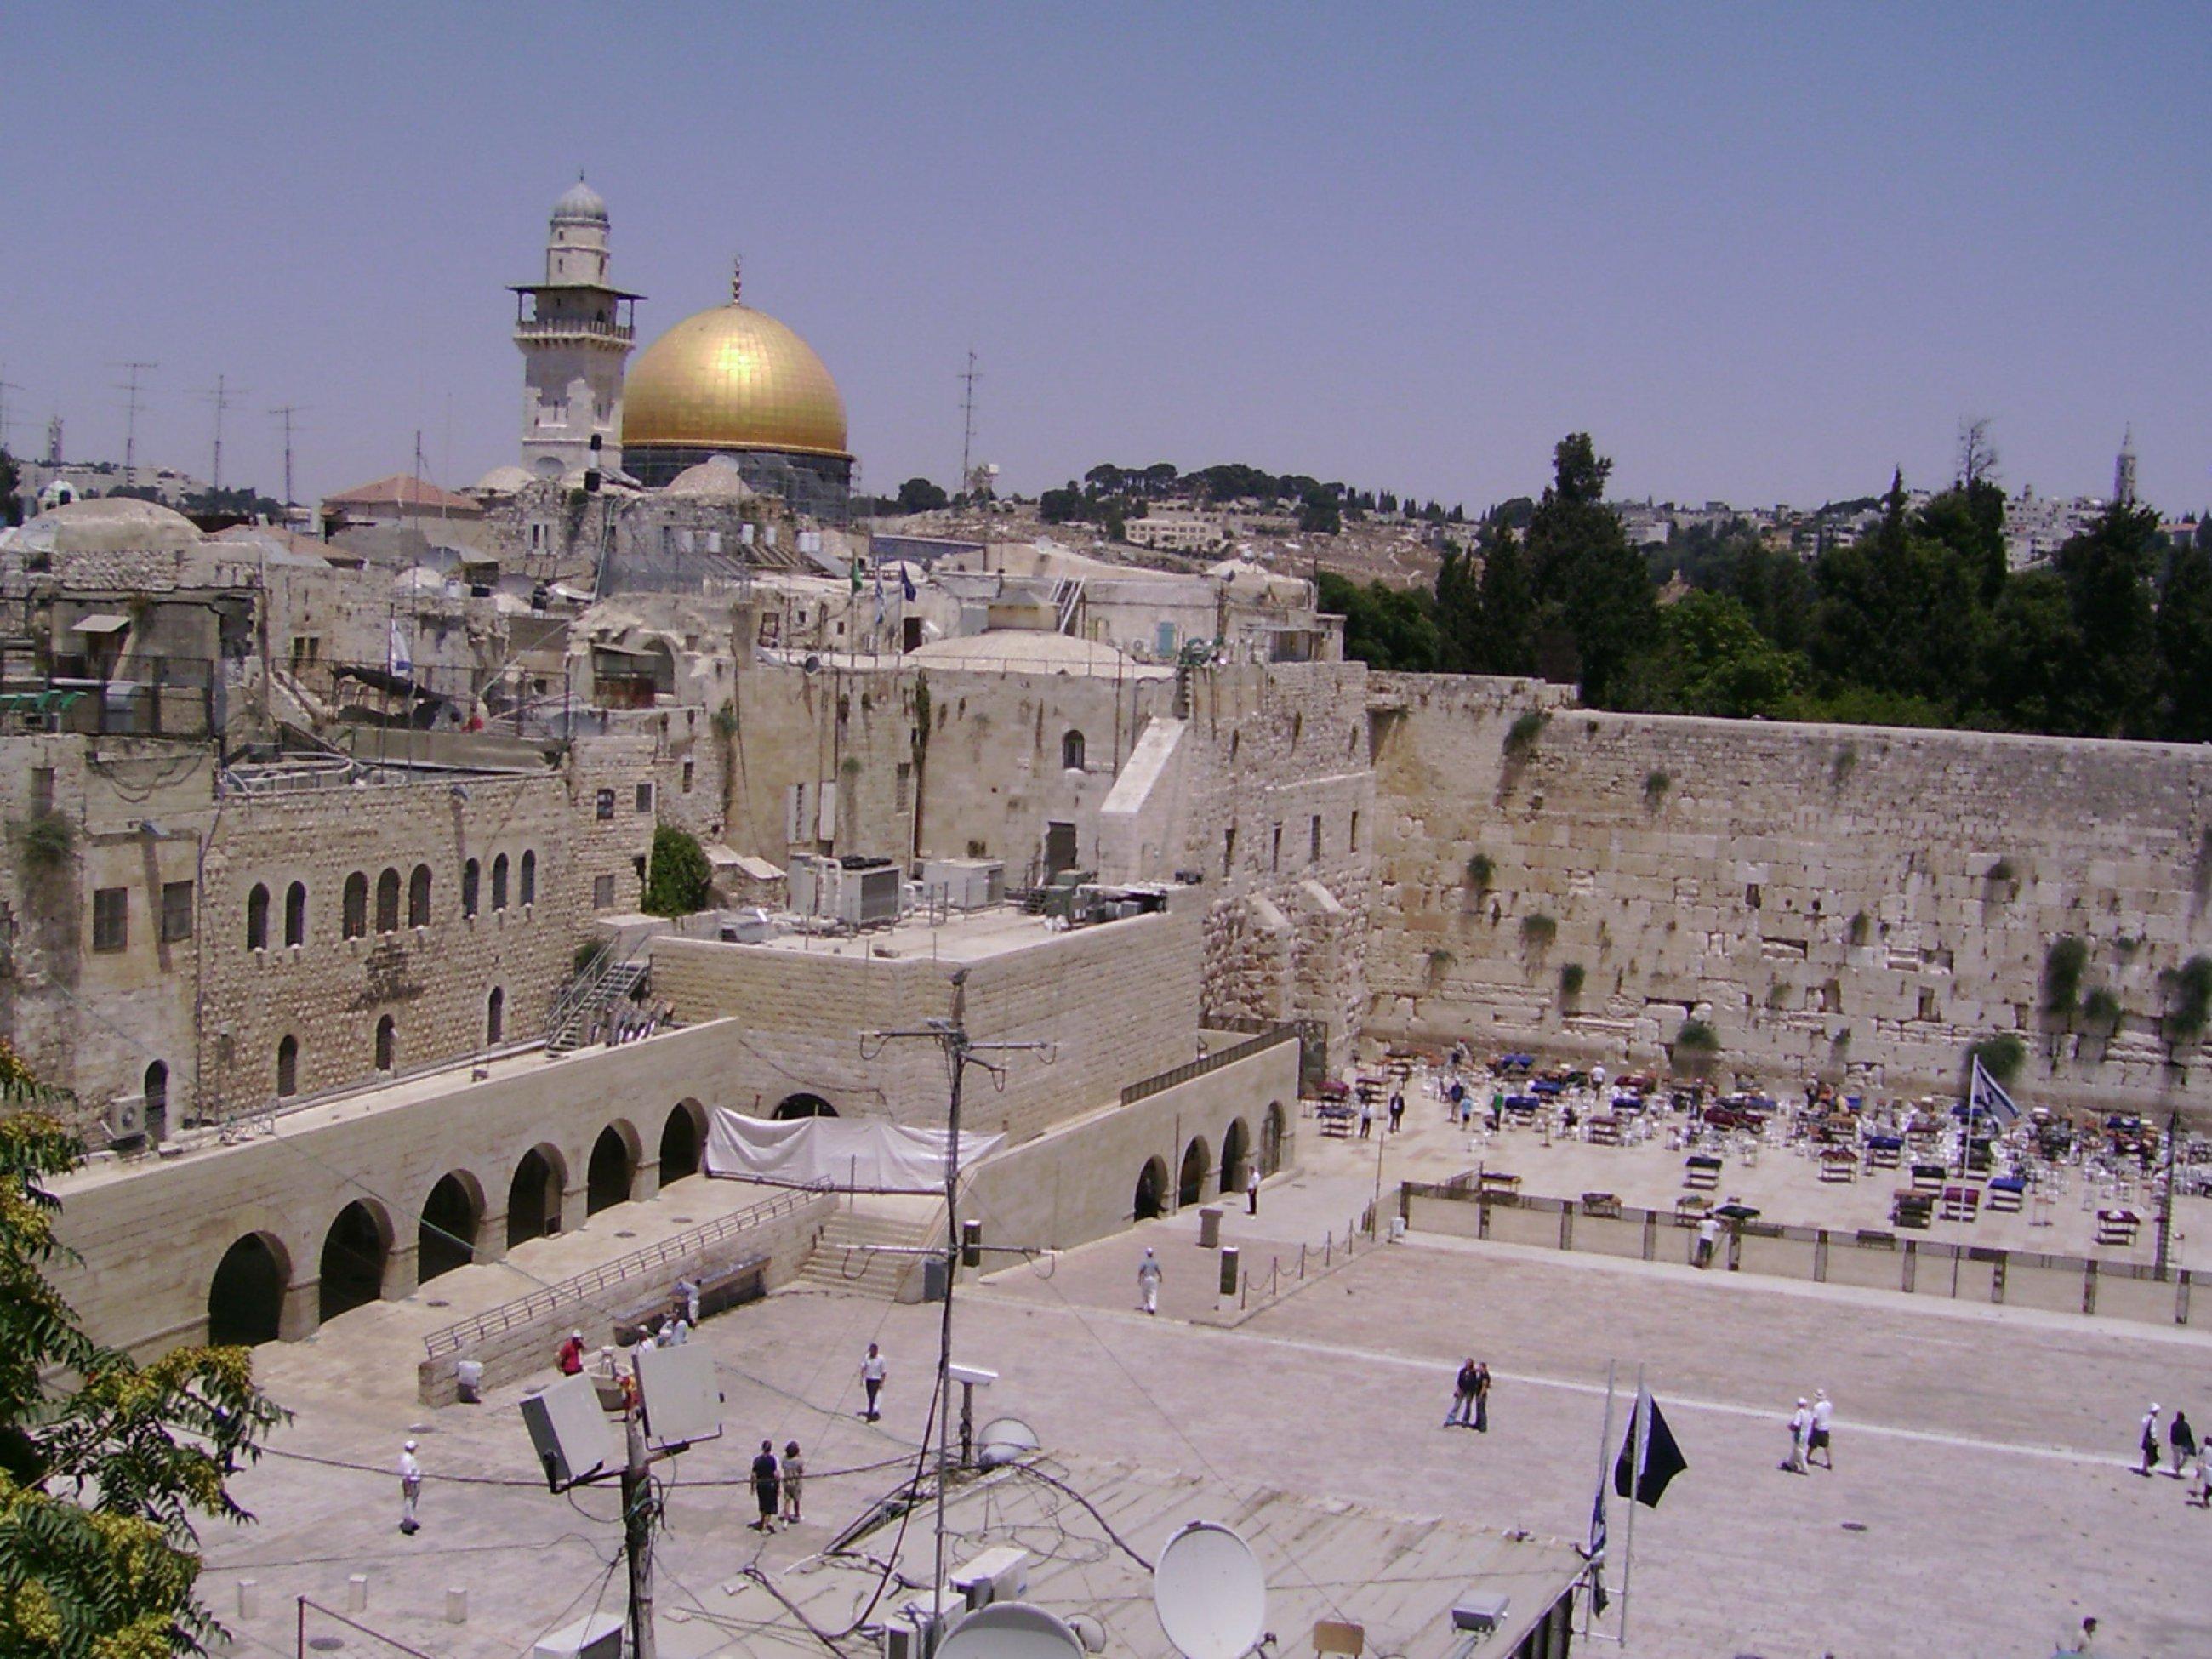 https://bubo.sk/uploads/galleries/4934/izrael-jeruzalem-mur-narekov.jpg